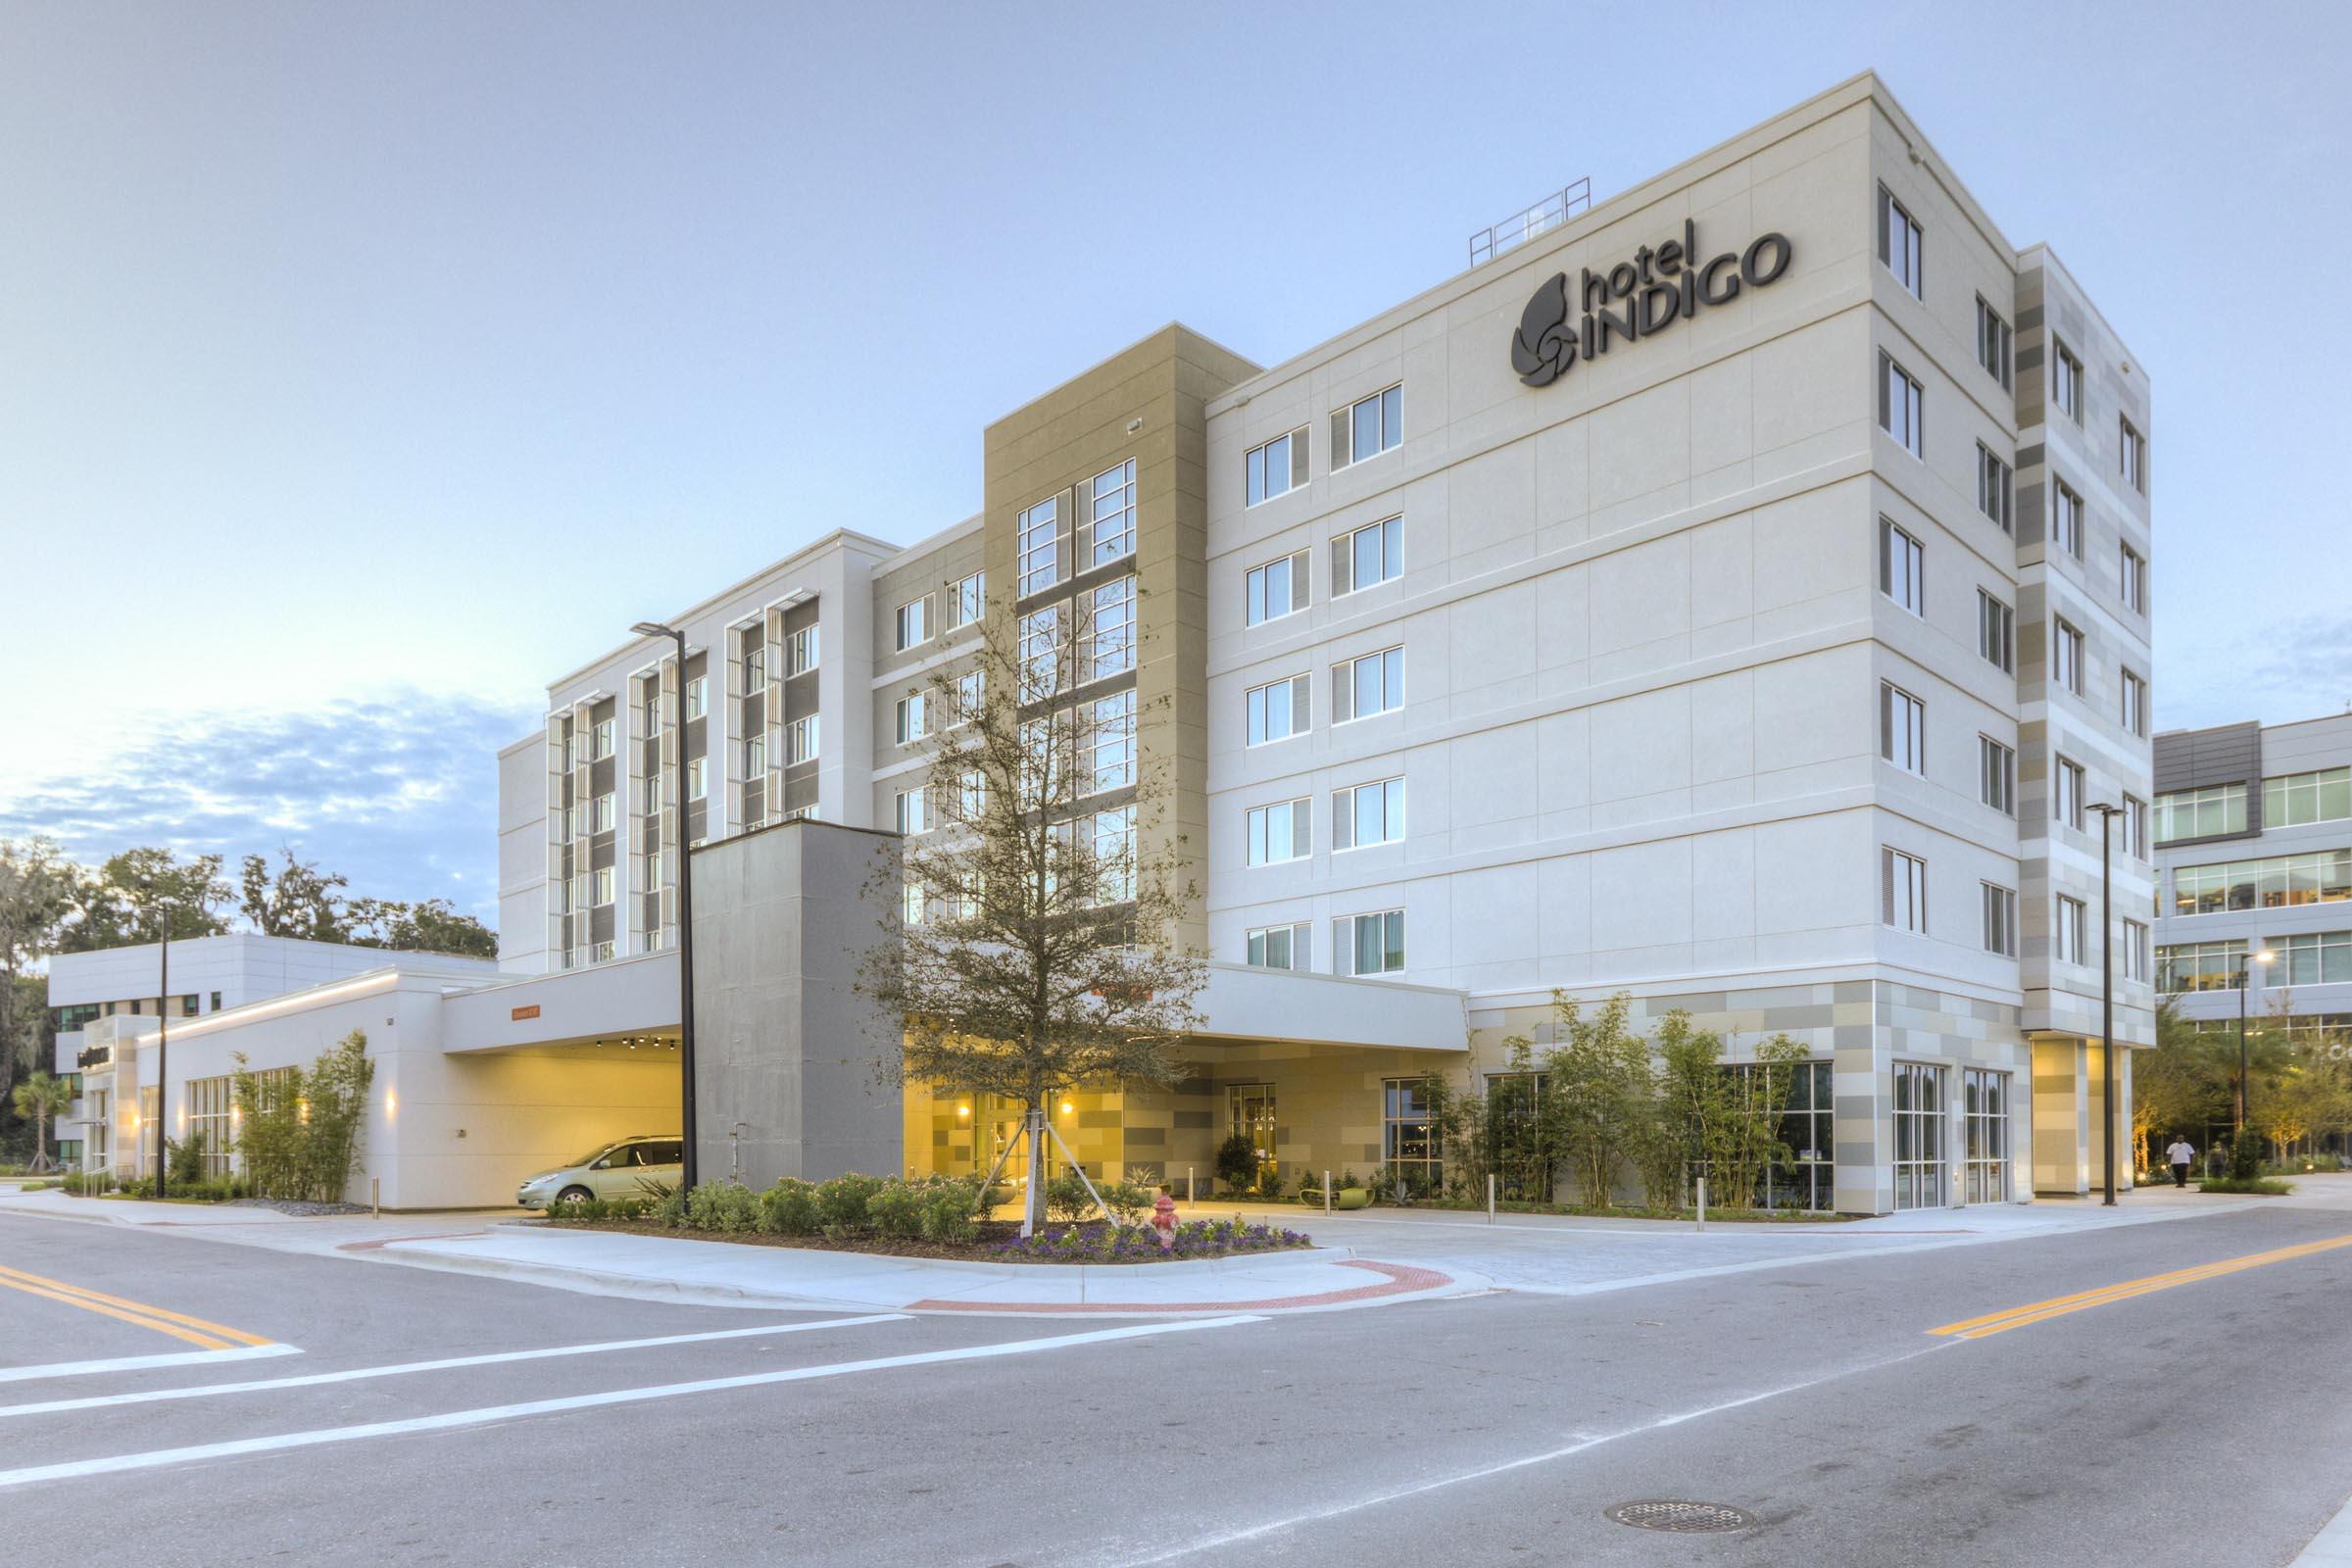 Hotel Indigo_1